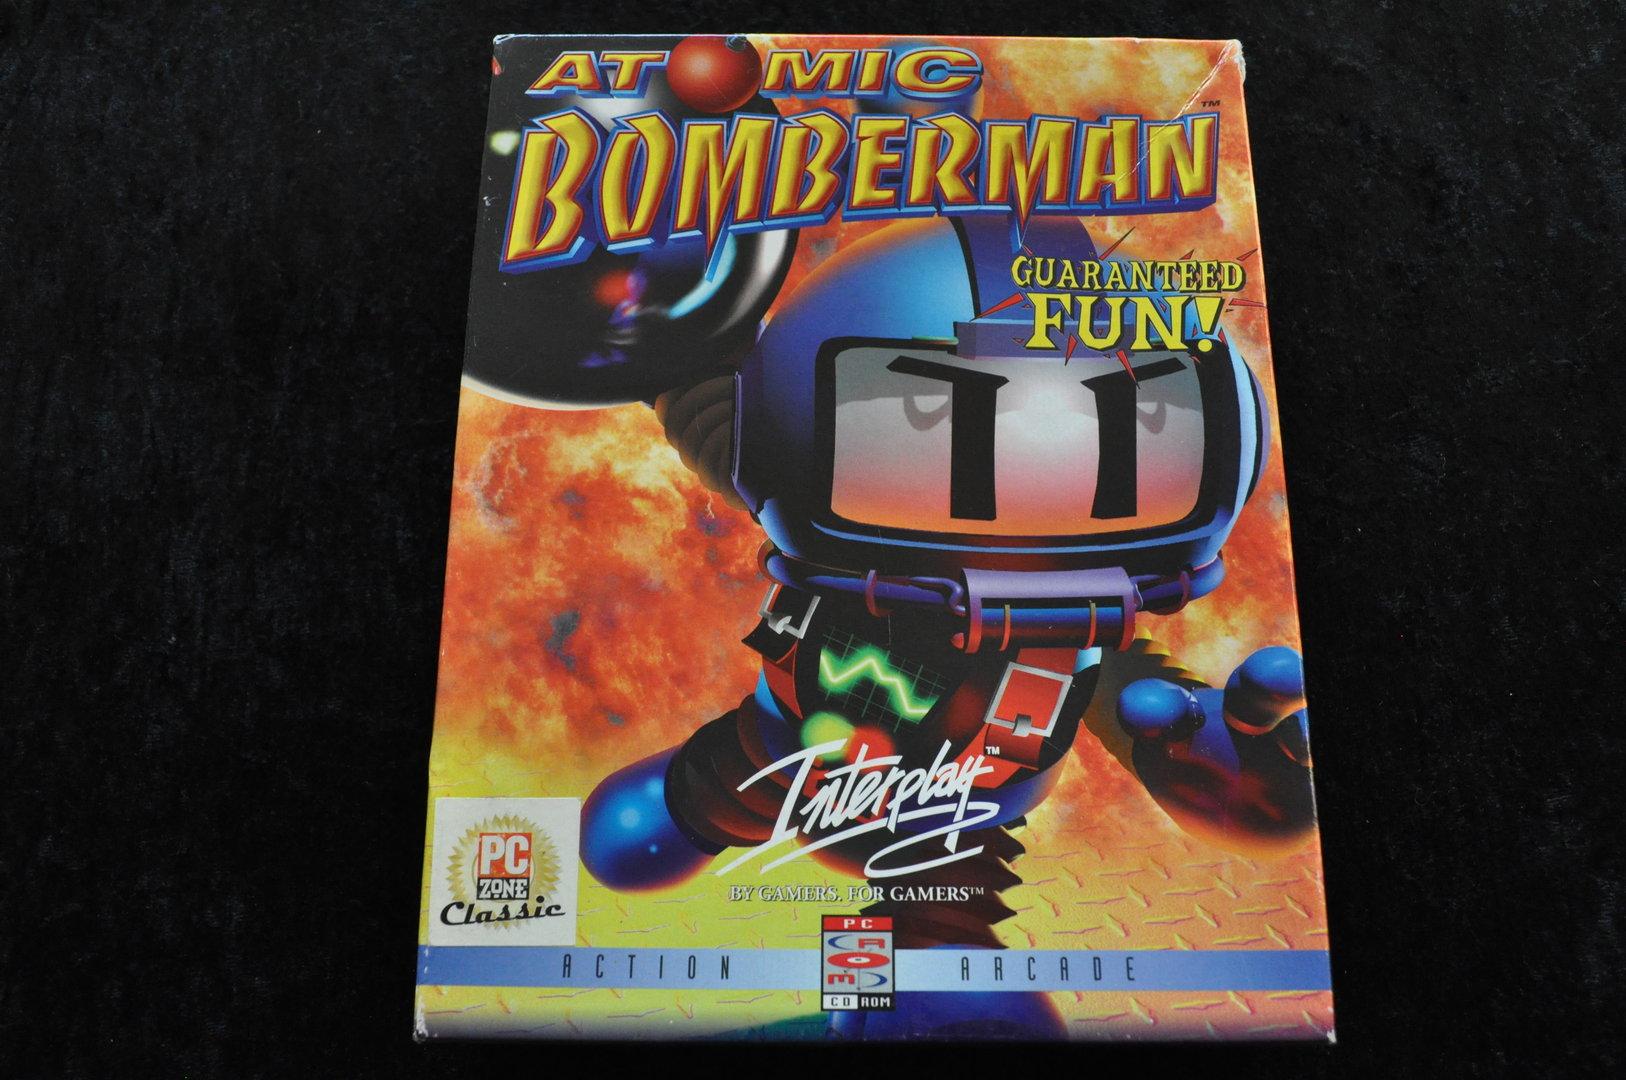 Atomic Bomberman Pc Isos - updatesbabysite's blog